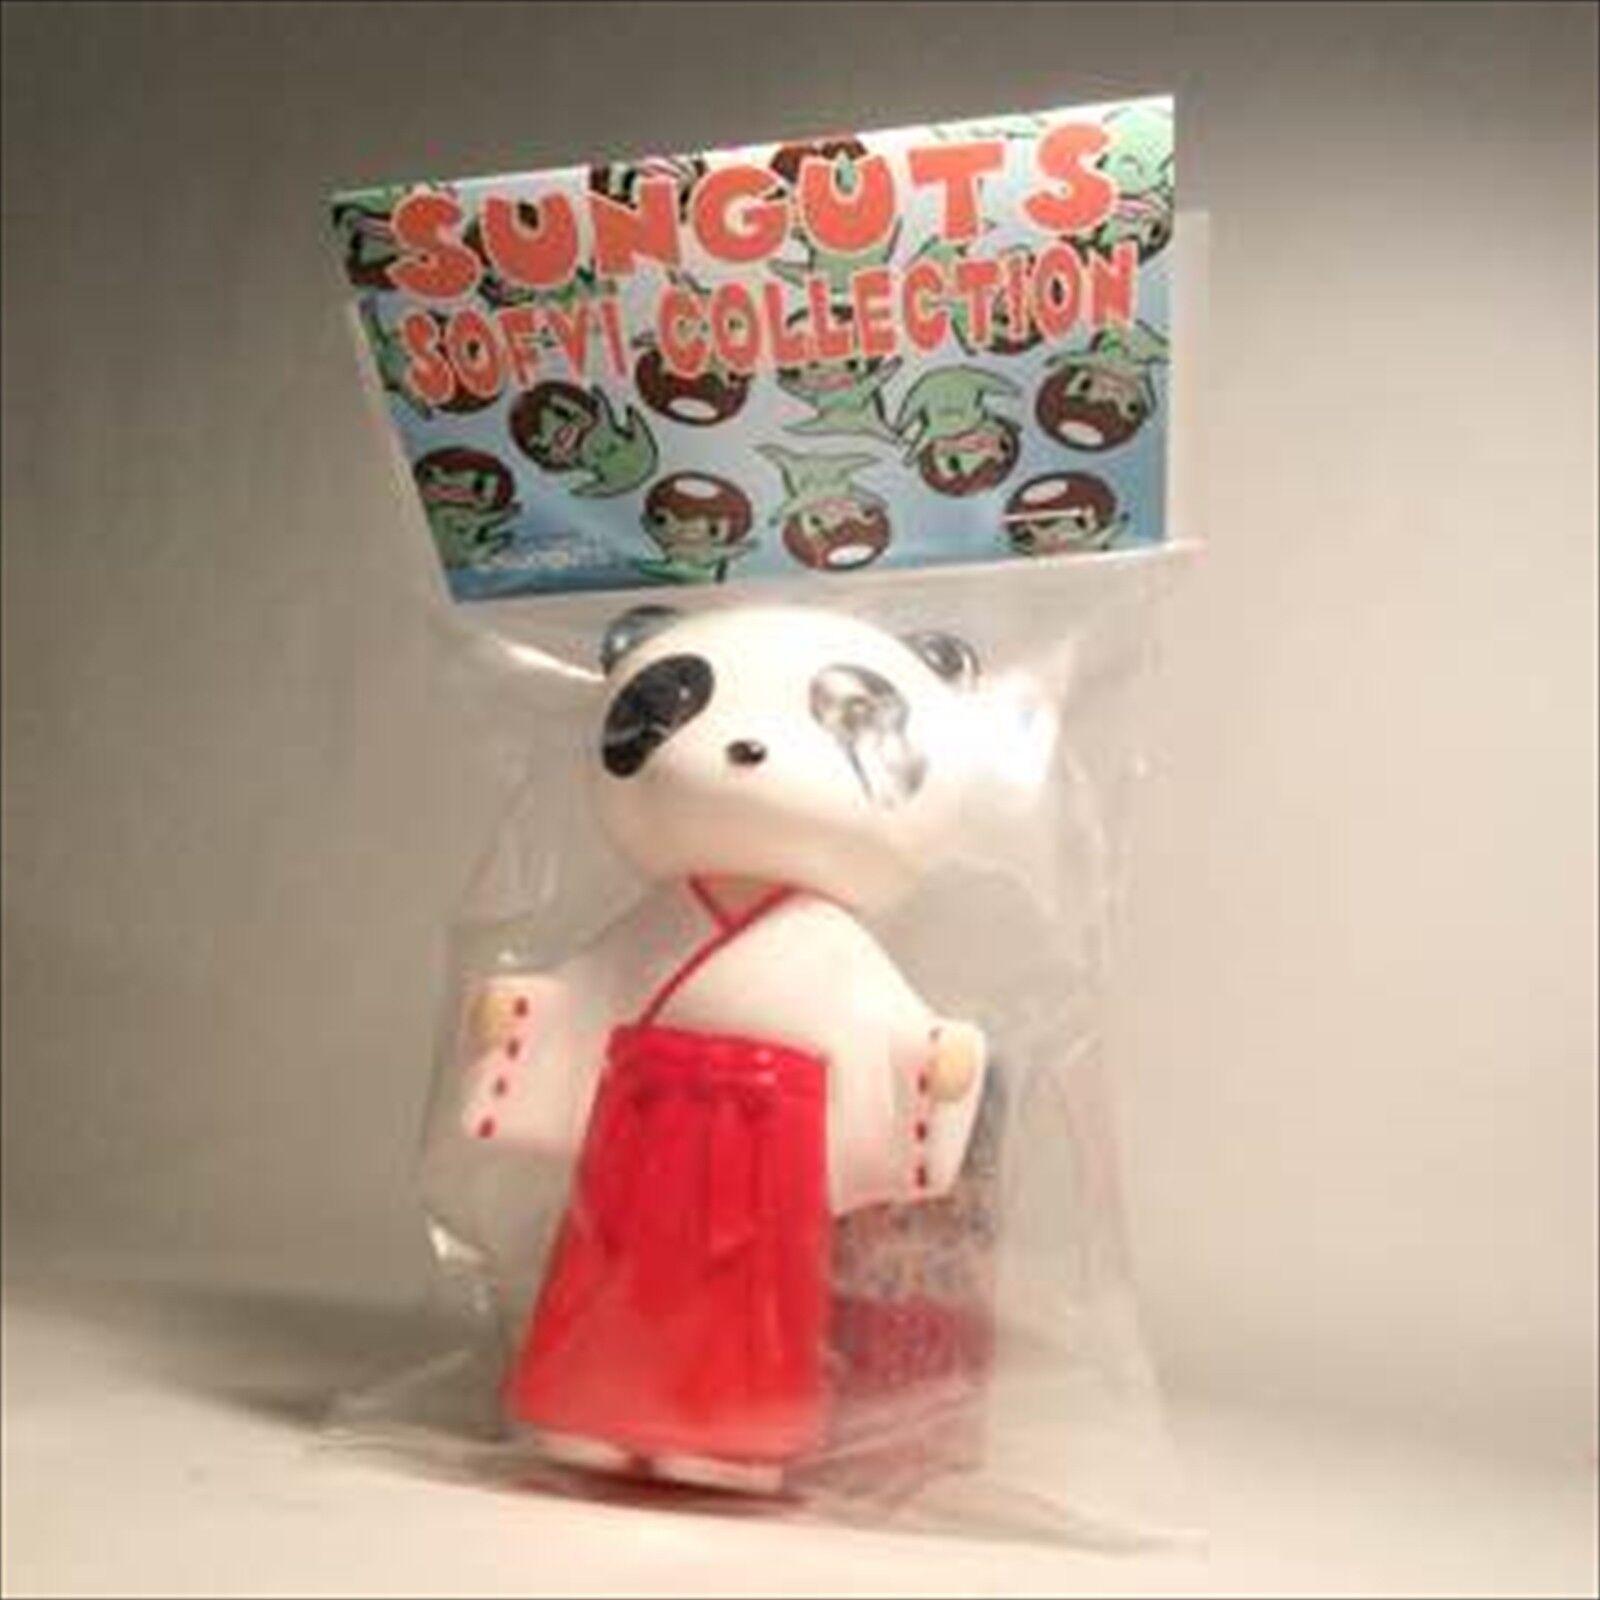 muchas concesiones Sunguts Honpo Panda santuario Maiden Maiden Maiden Kanda miosina limitada Mancha Soft Vinilo F S Jp  caliente